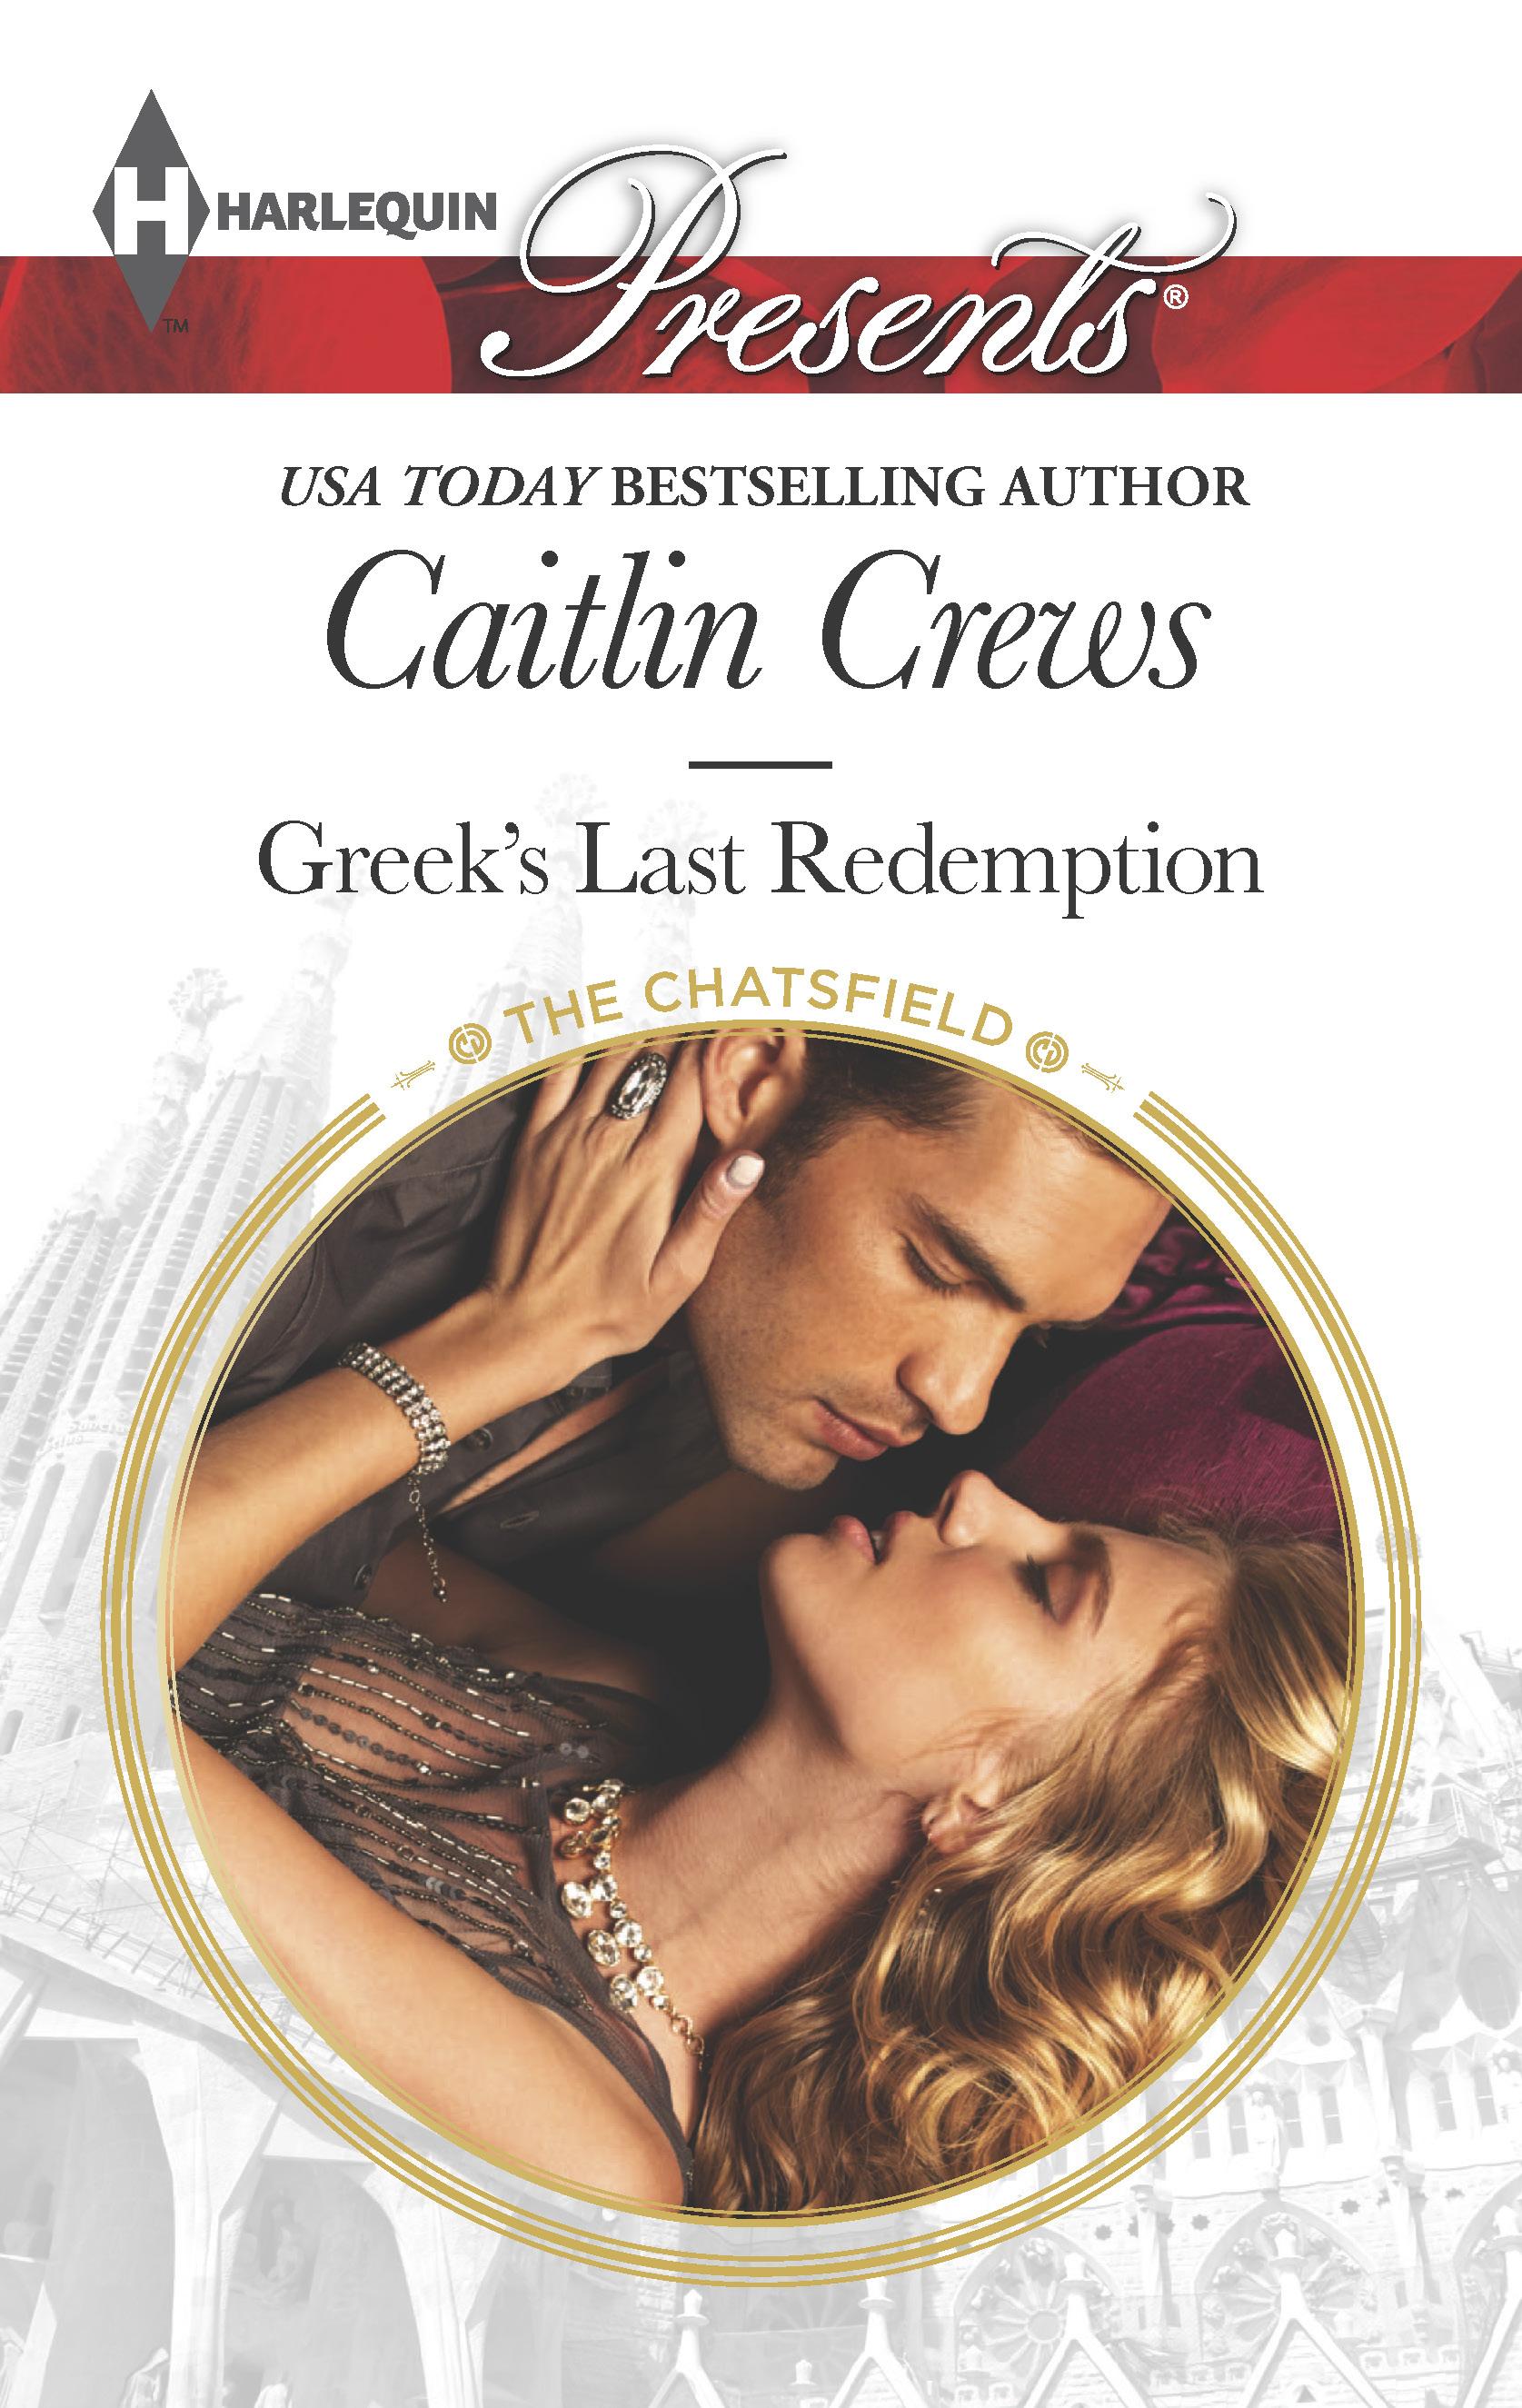 Greek's Last Redemption by Caitlin Crews